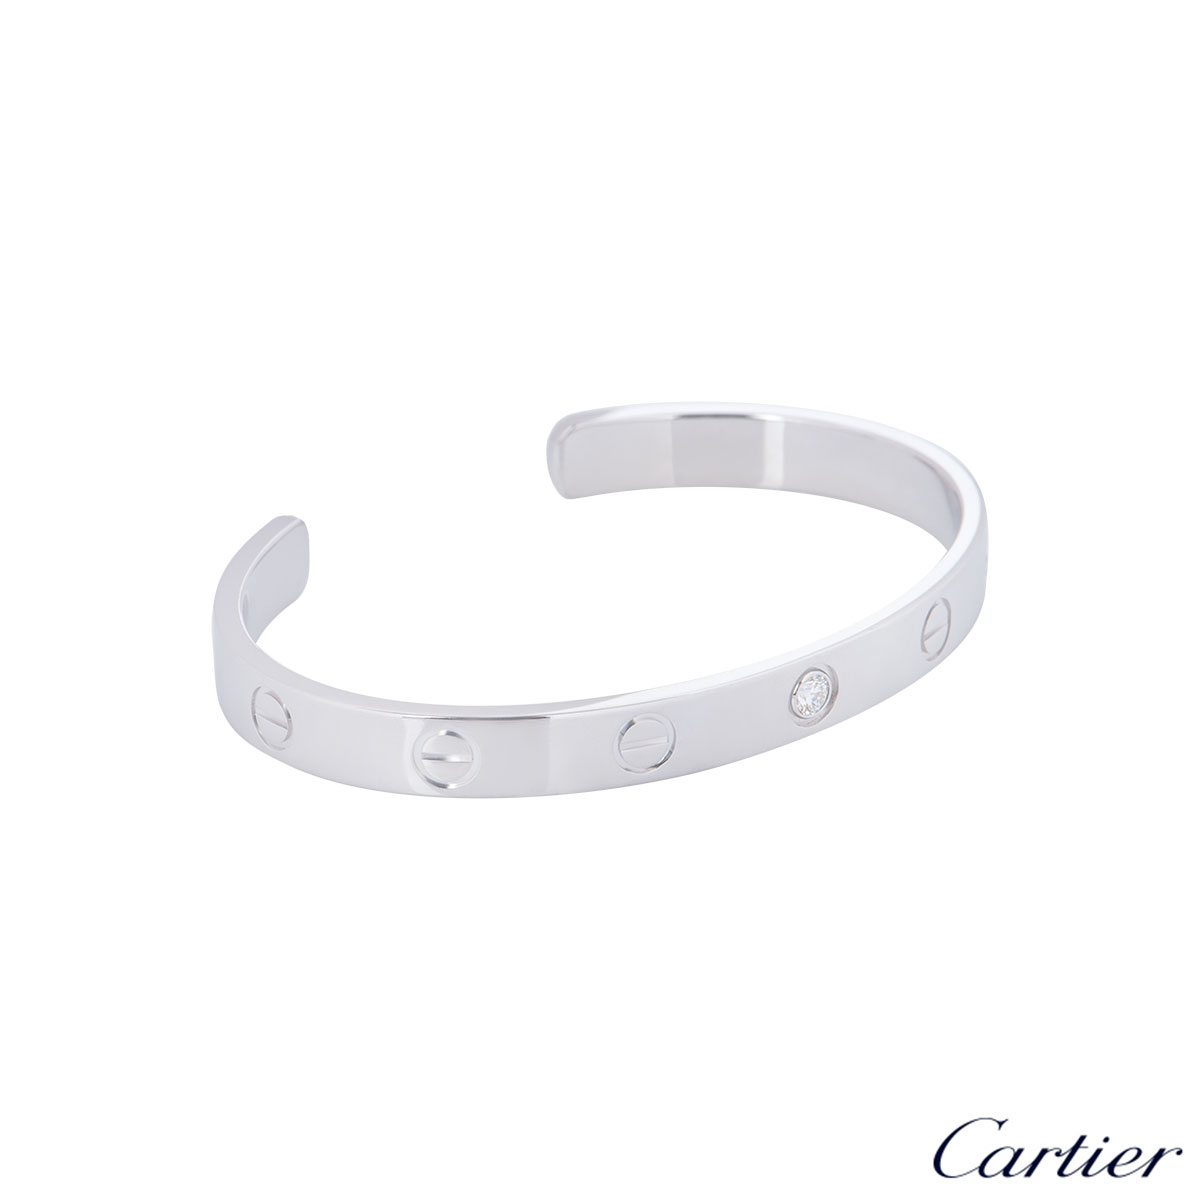 Cartier White Gold Diamond Cuff Love Bracelet Size 18 B6029918